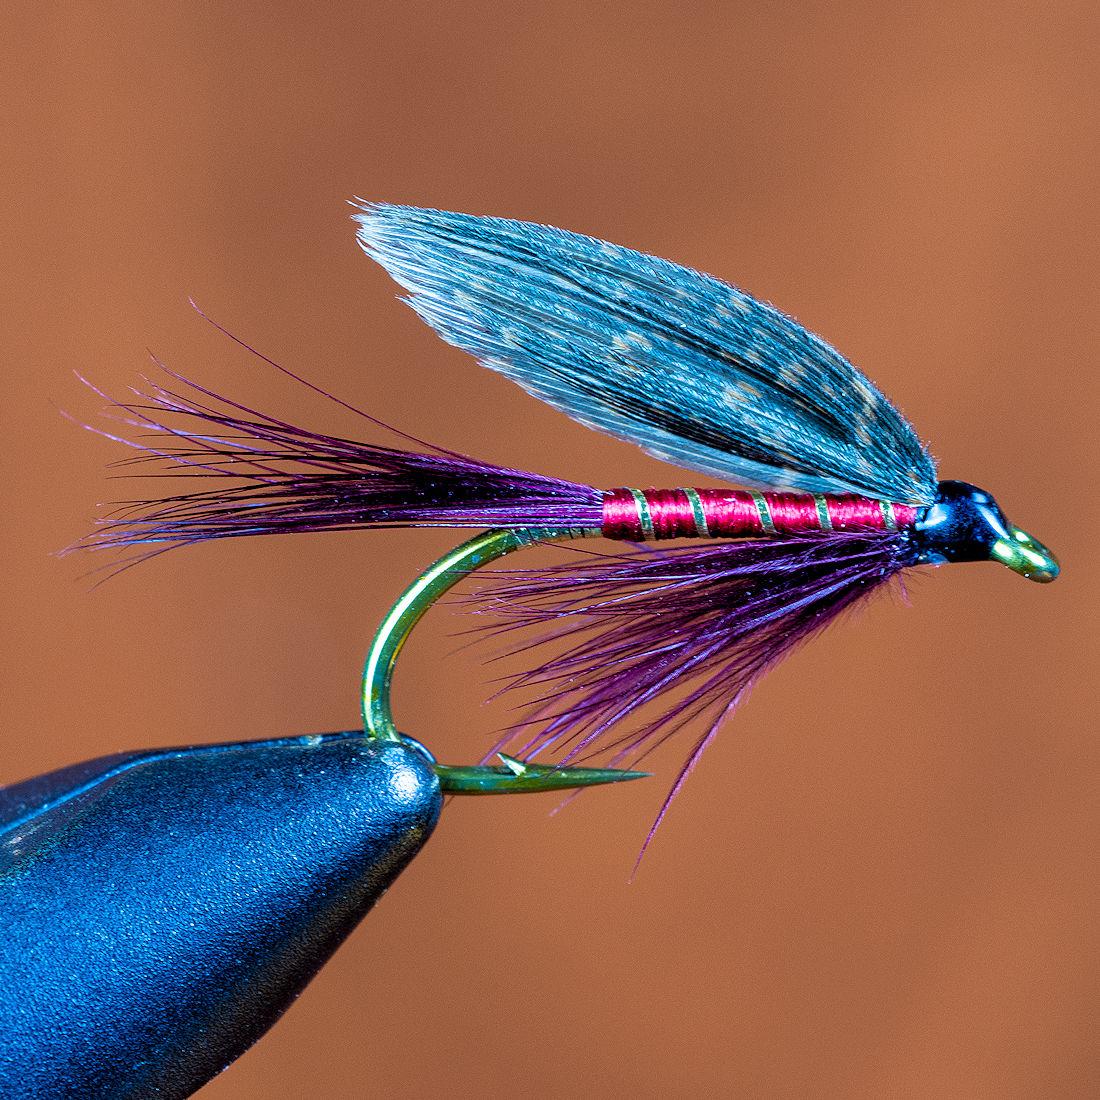 the-dark-montreal-fly-02-lrg.jpg